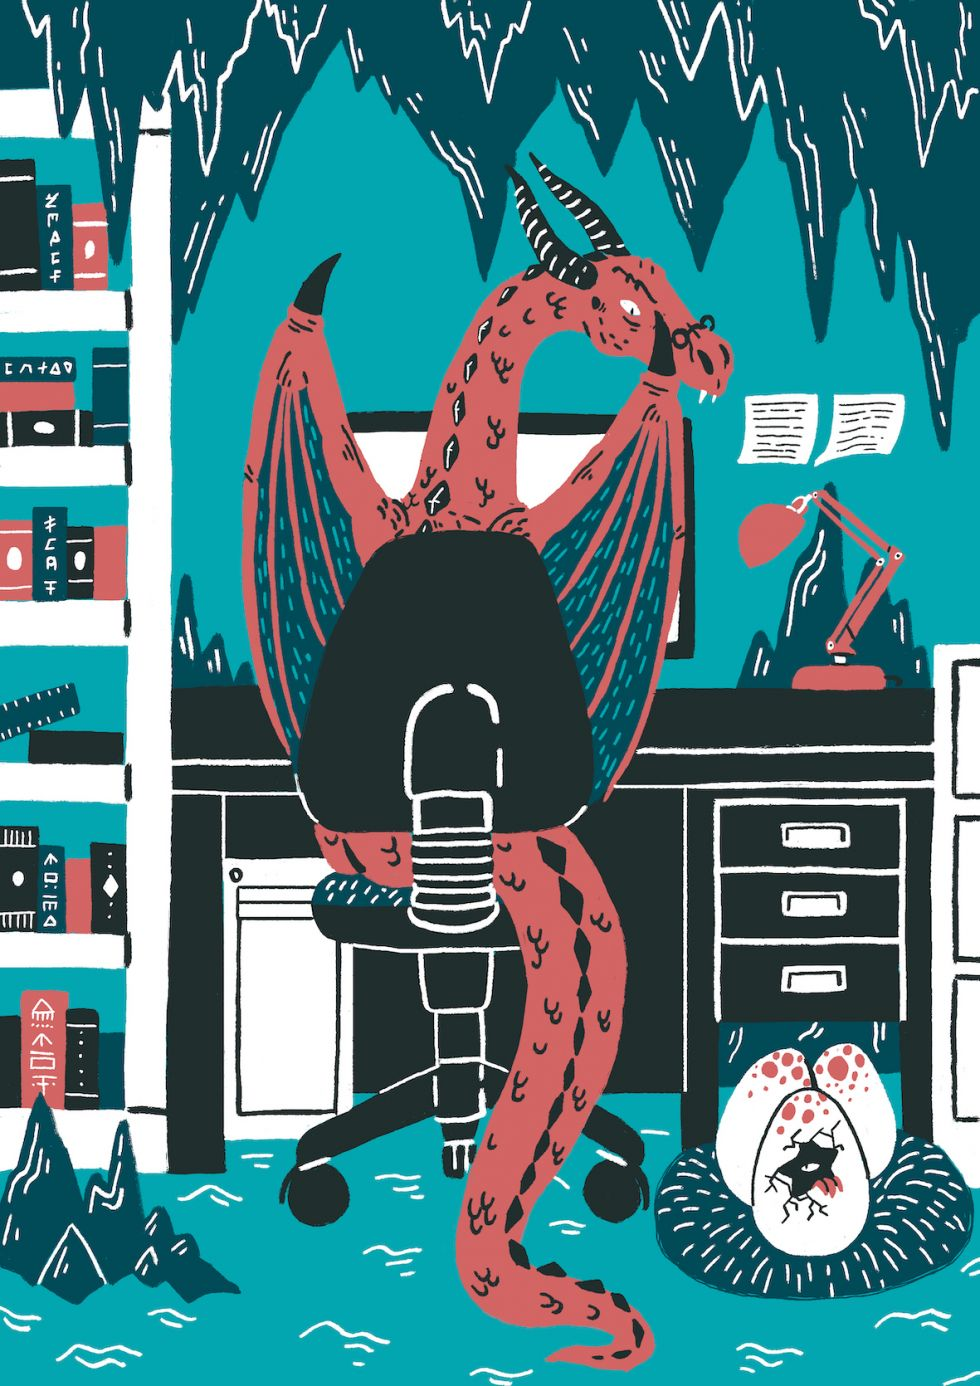 Working Dragon Illustration by Daniel Nelson